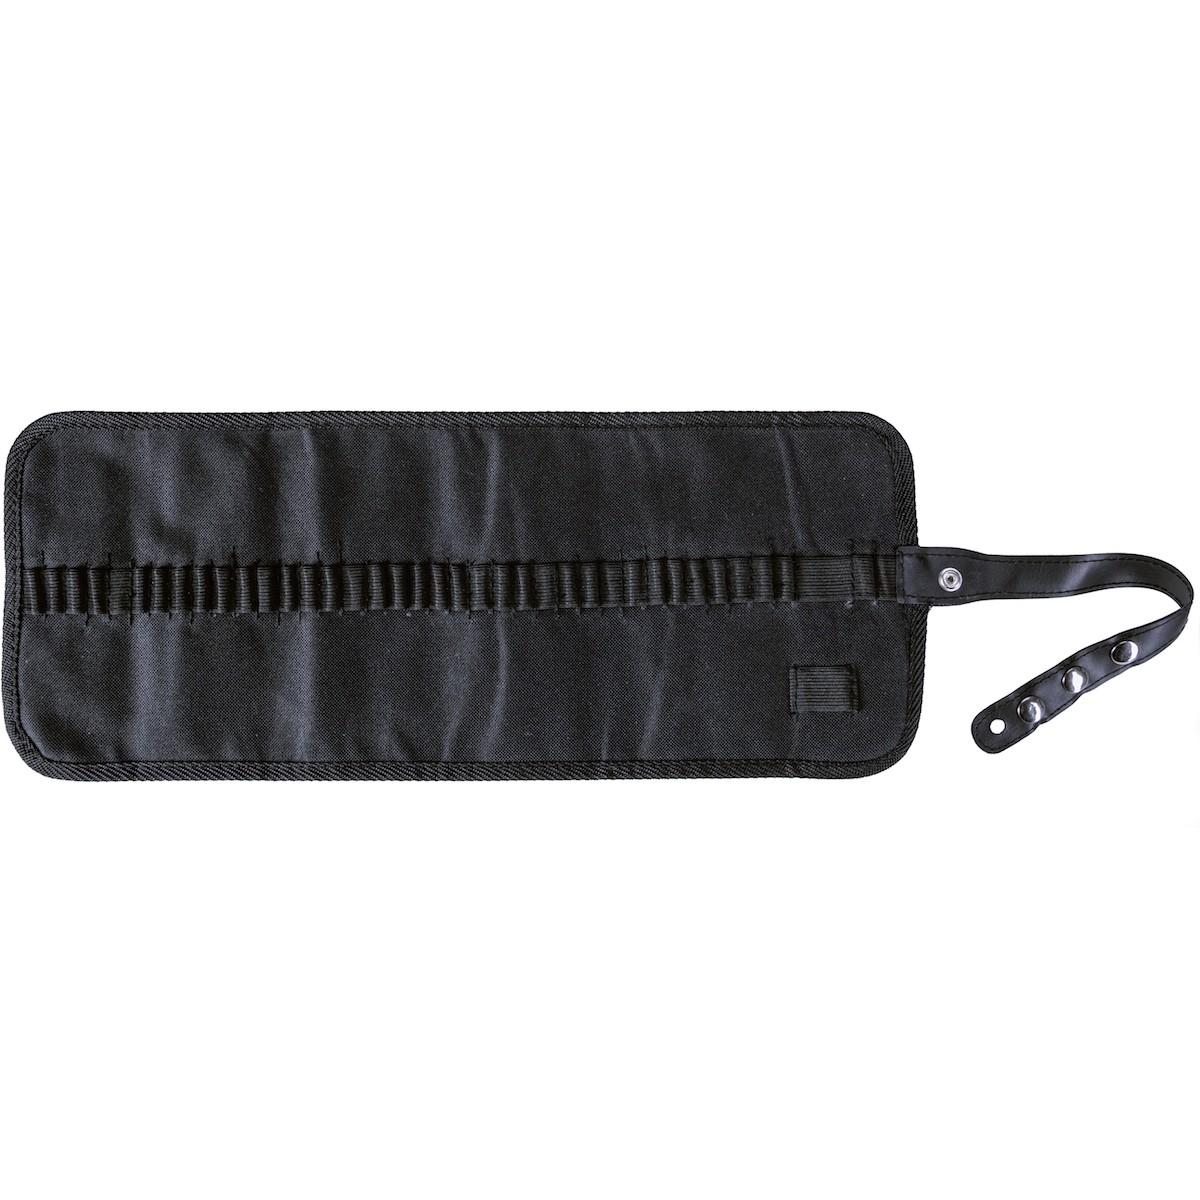 Penalhus, sort, 49x20 cm, fleksibel